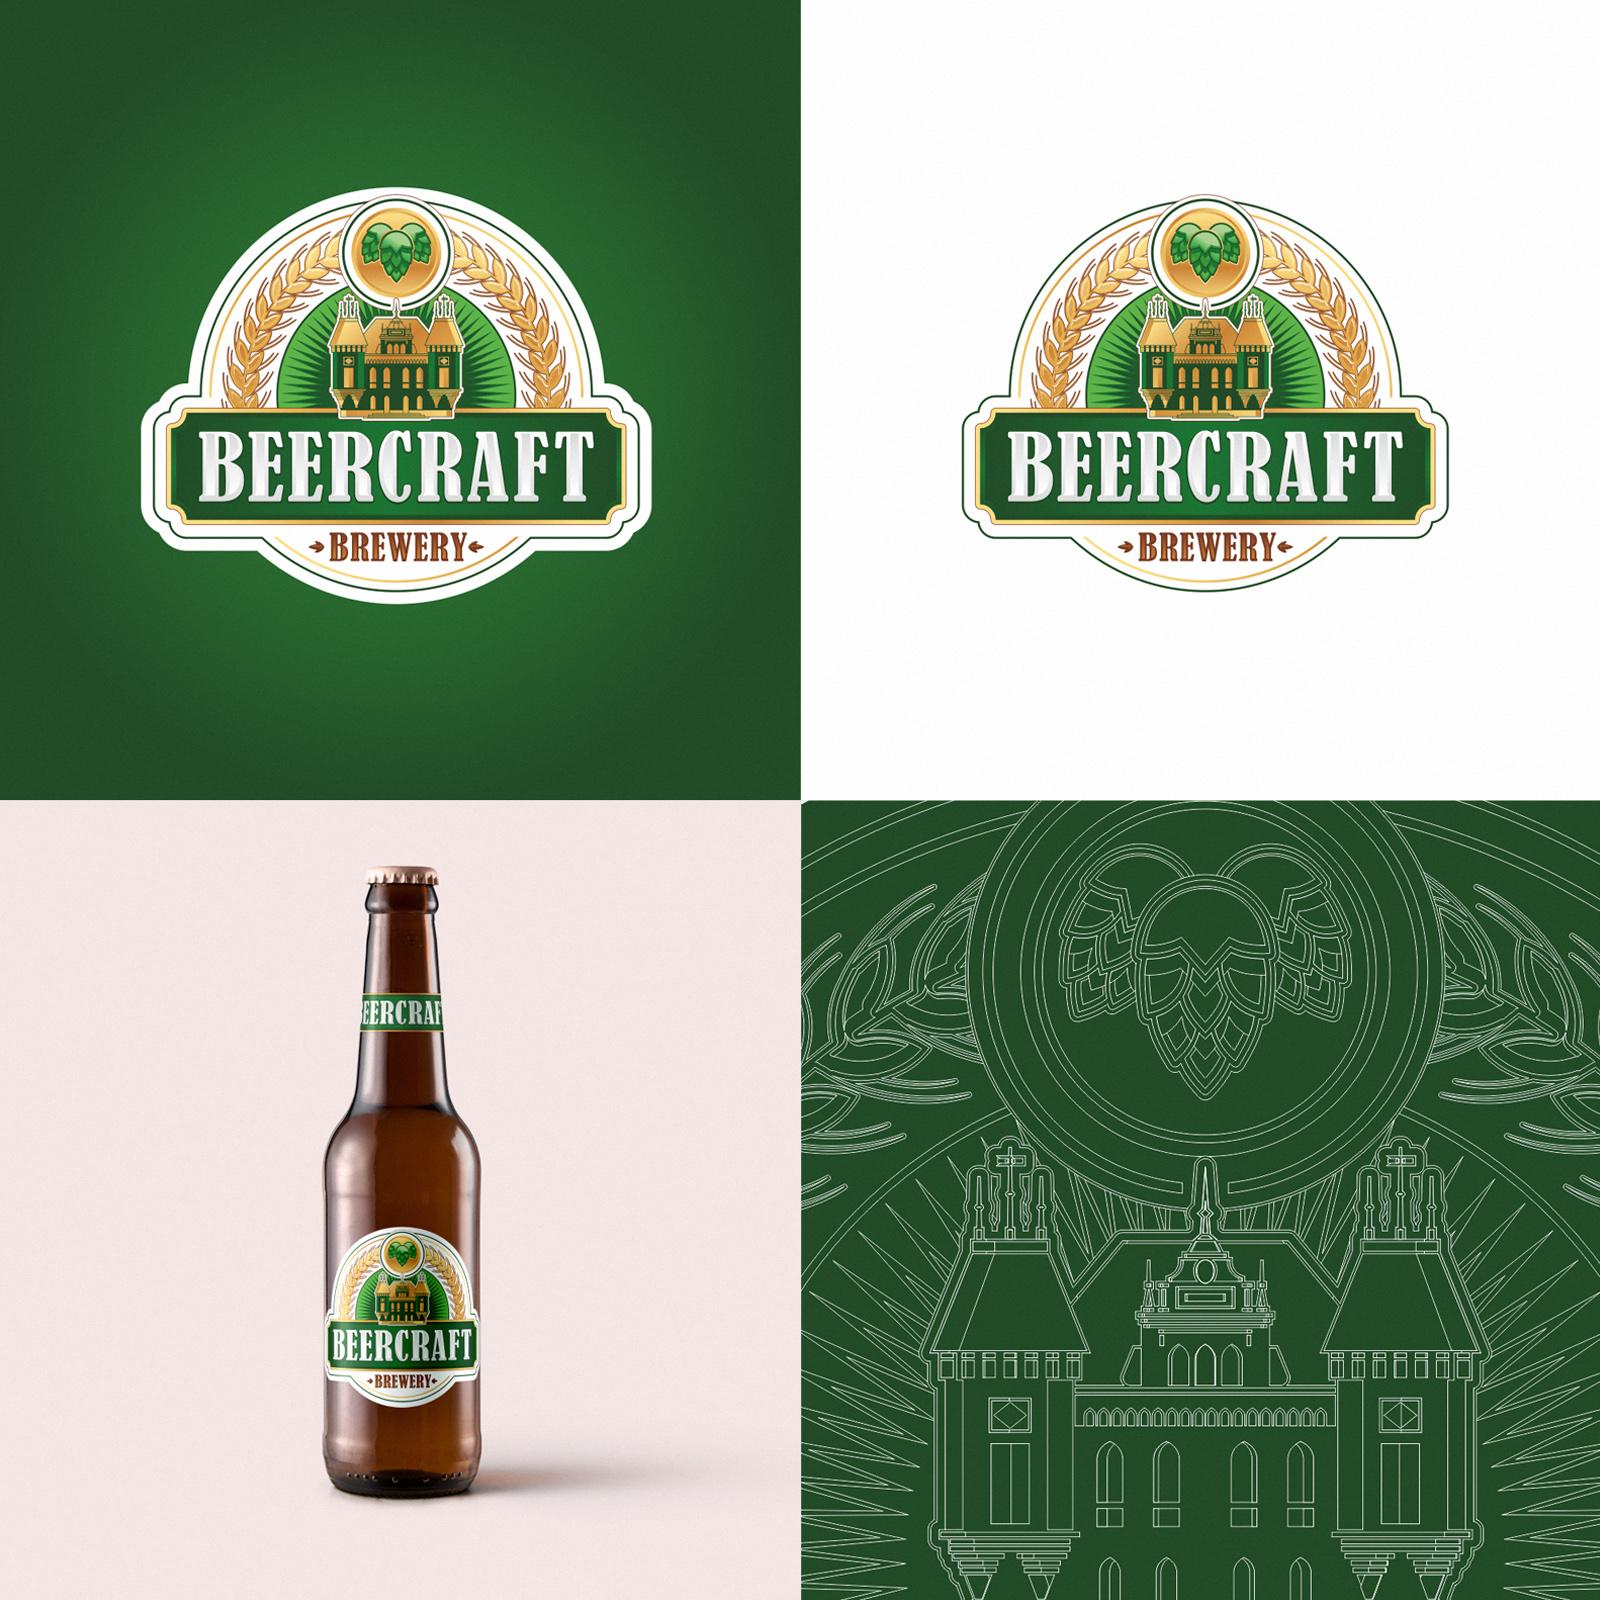 Beercraft